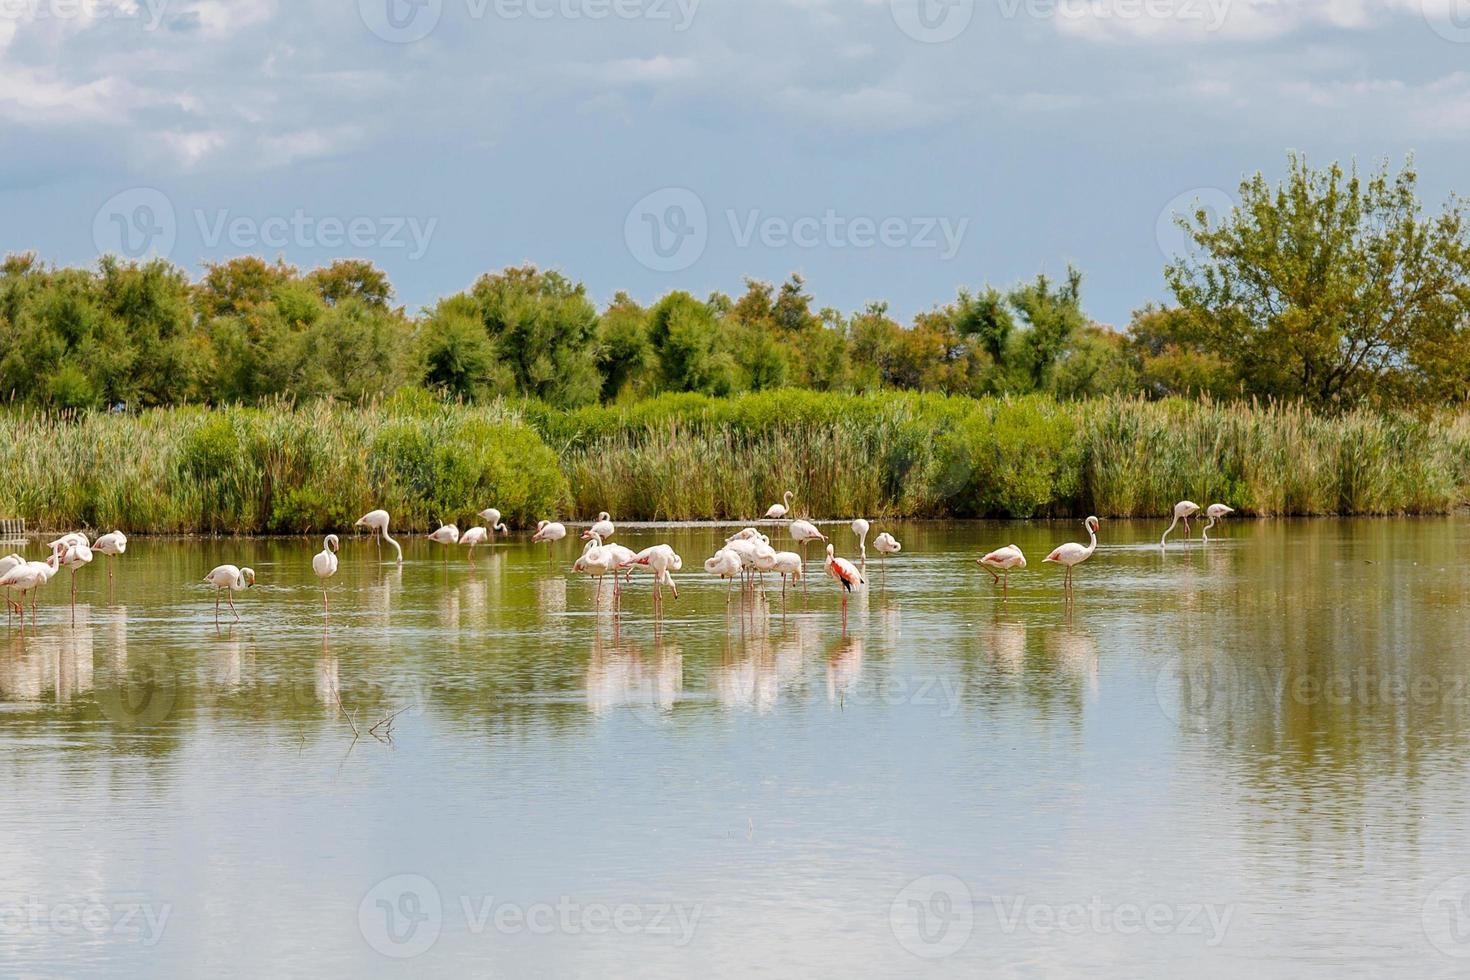 wilde flamingovögel im see in frankreich, camargue, provence foto